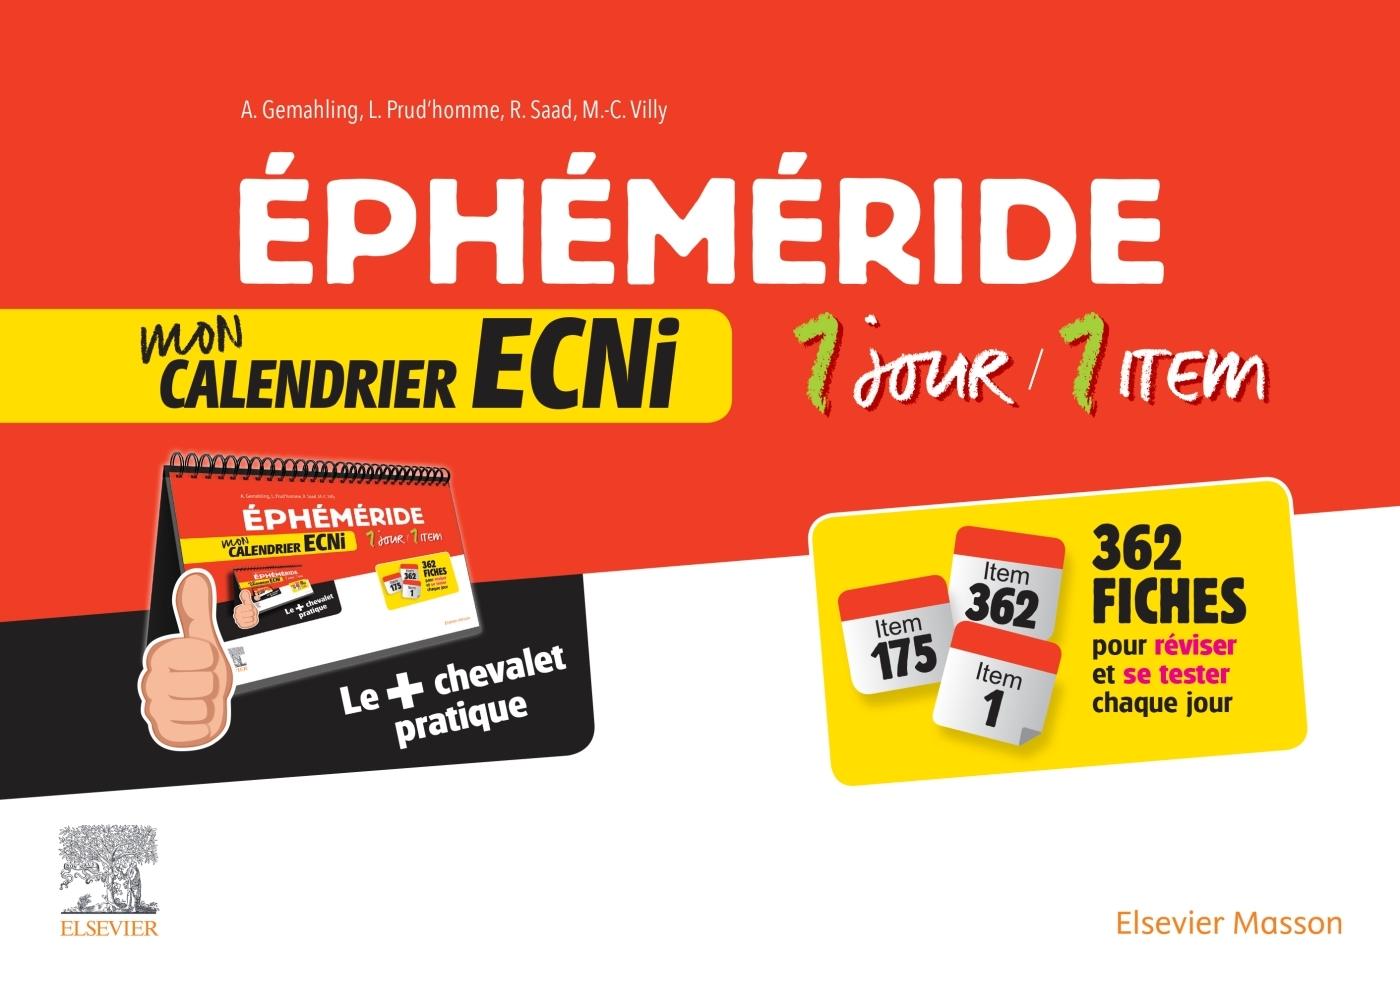 EPHEMERIDE : MON CALENDRIER ECNI. 1 JOUR / 1 ITEM